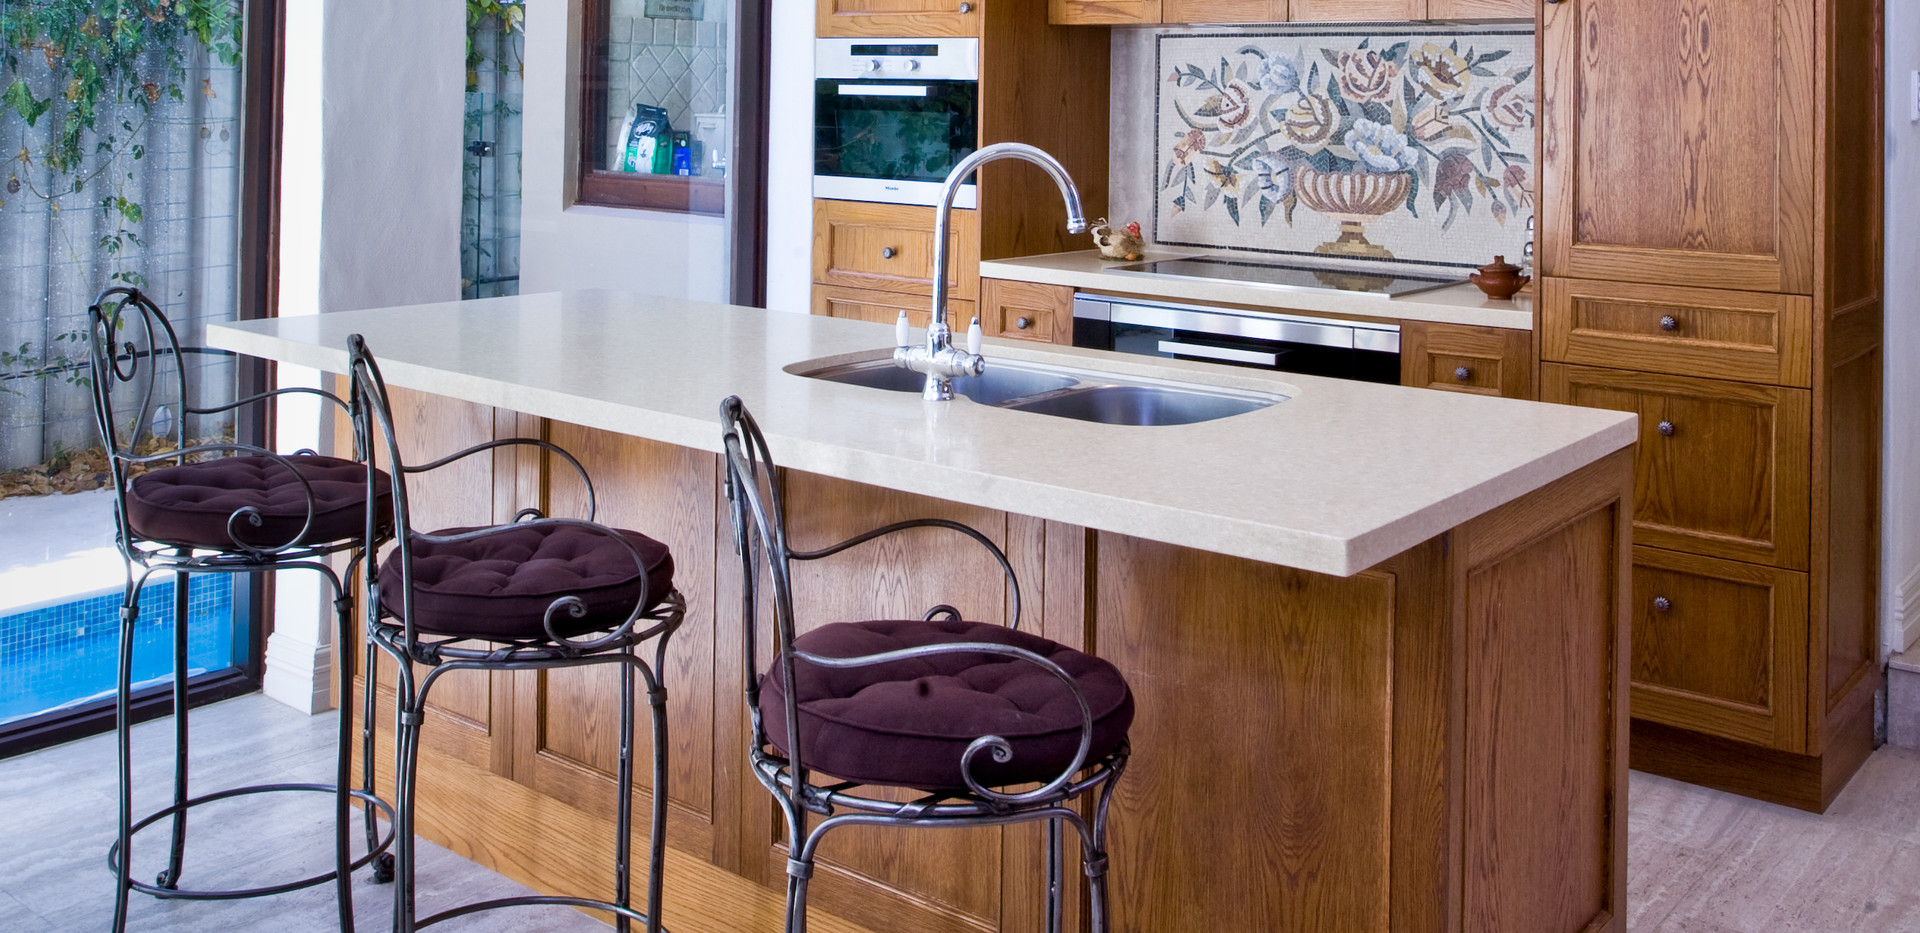 Kitchens_JPEG_000-5.jpg